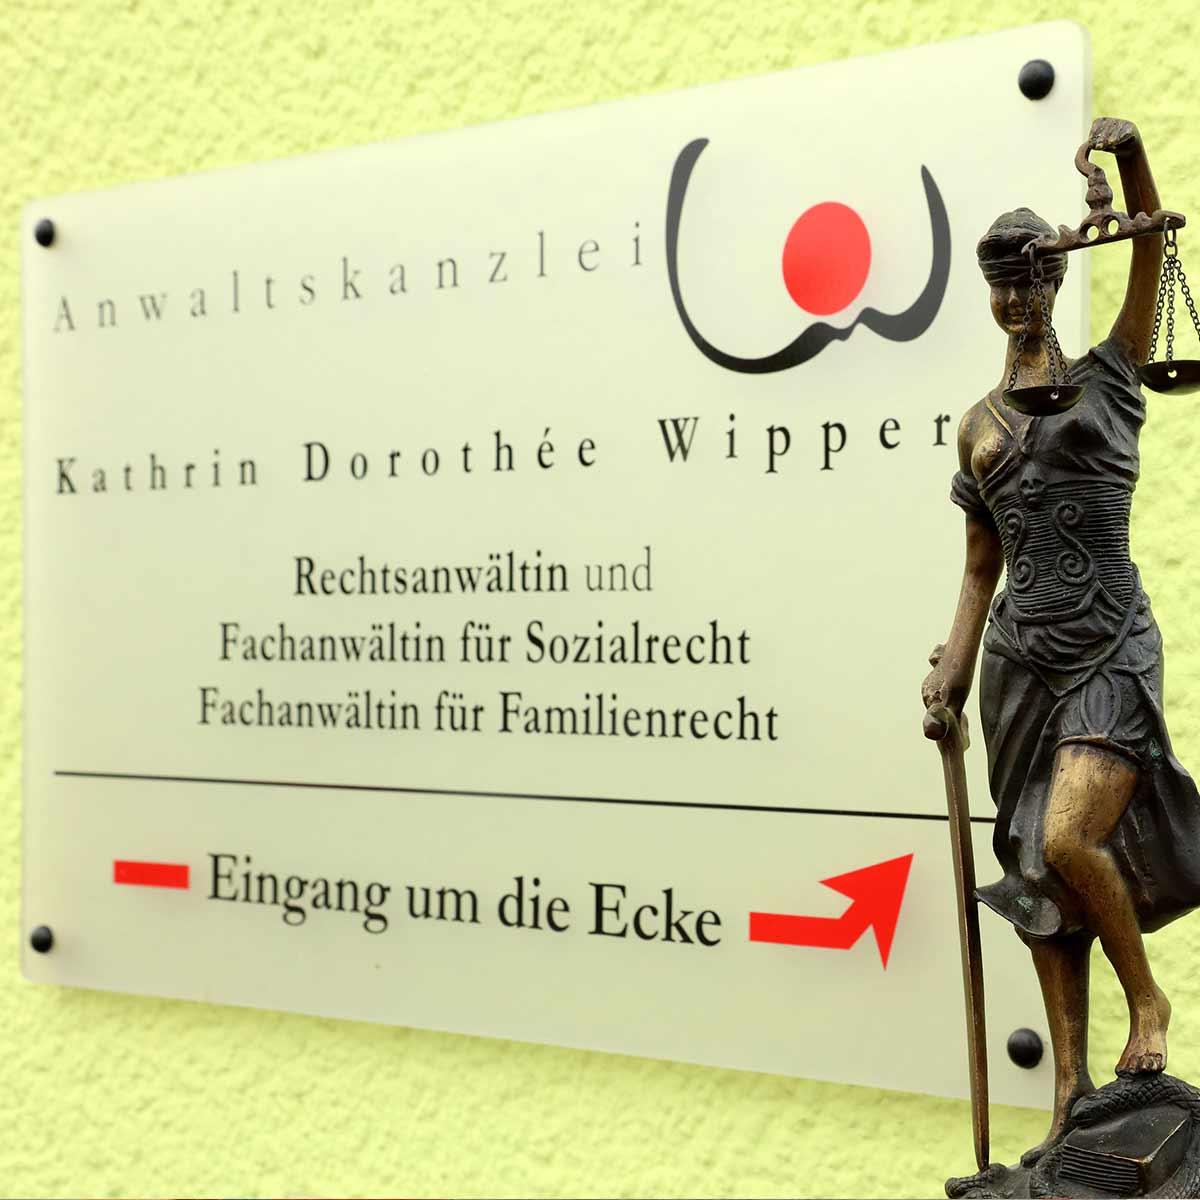 Anwältin Kathrin Dorothée Wipper, Büdingen